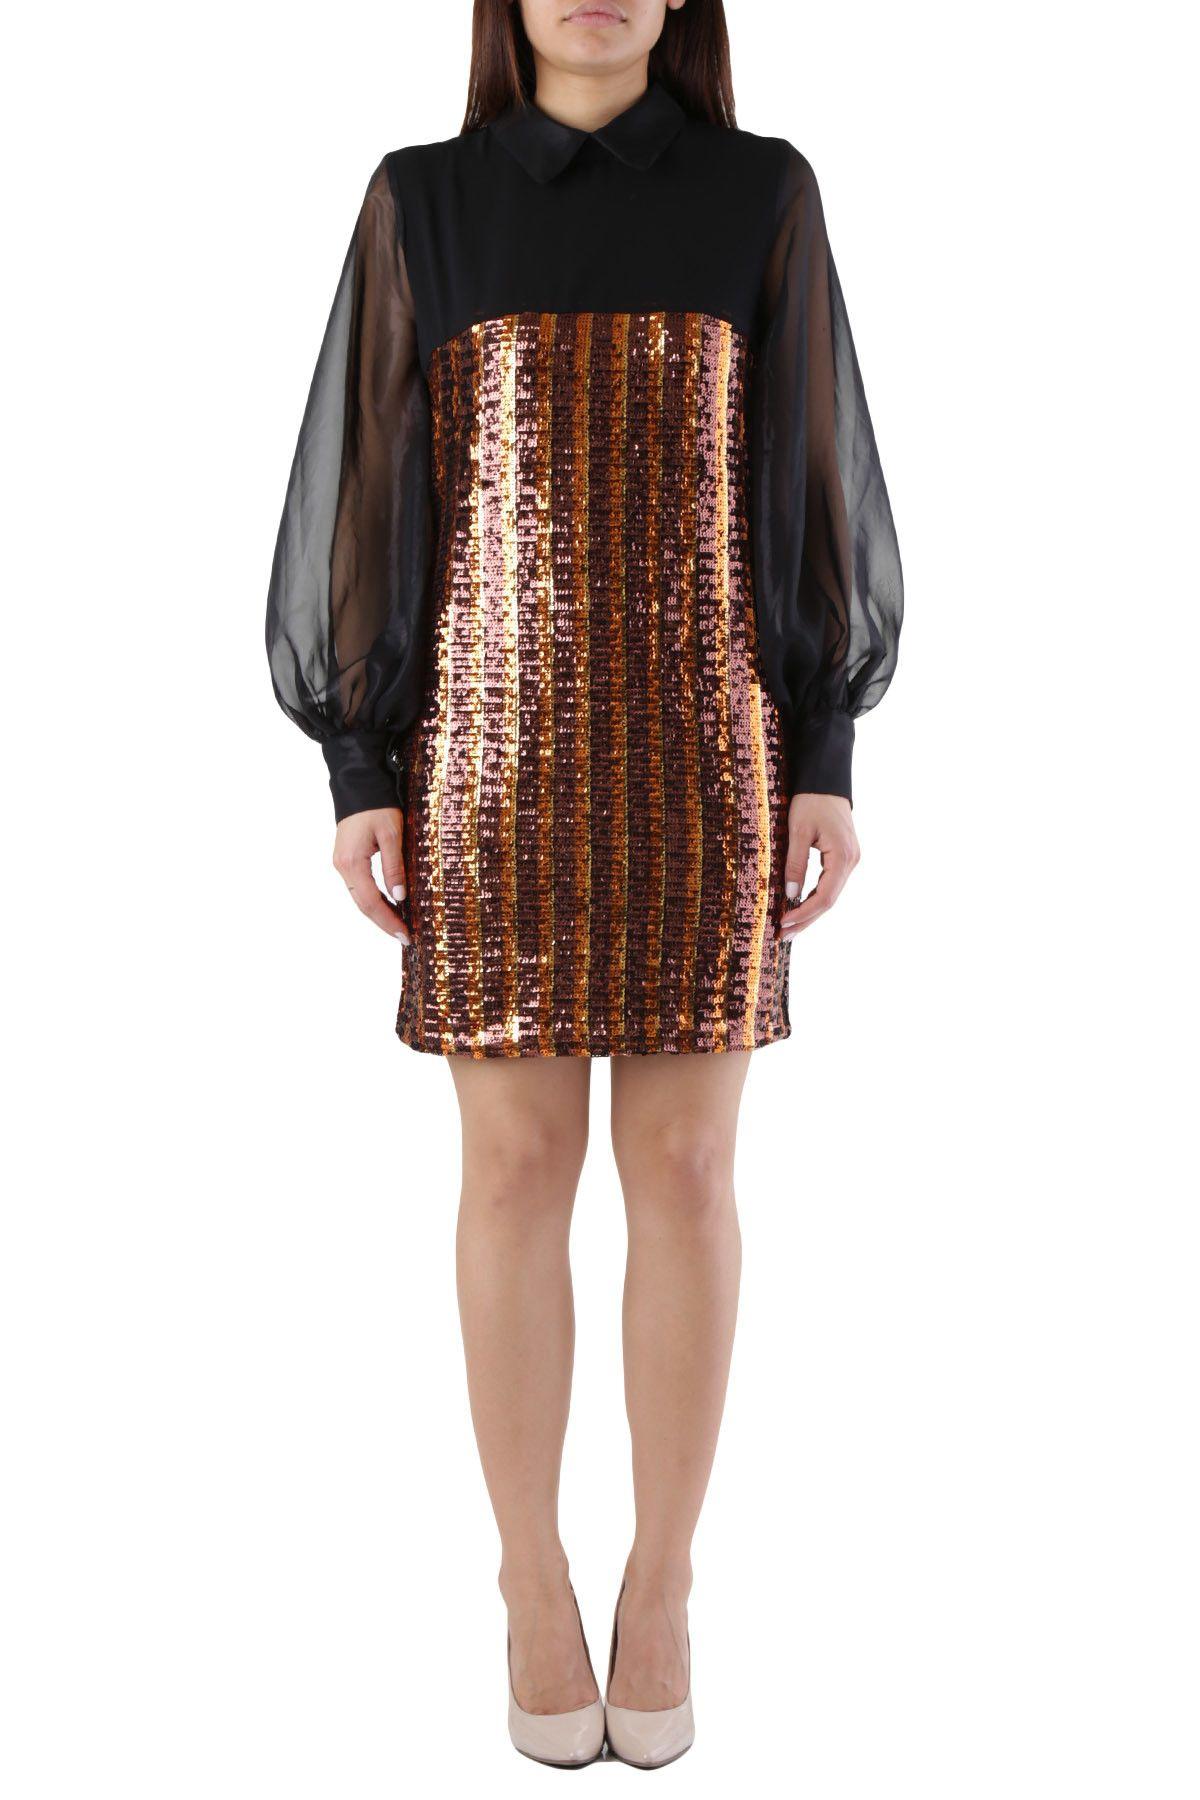 Olivia Hops Women's Dress In Black